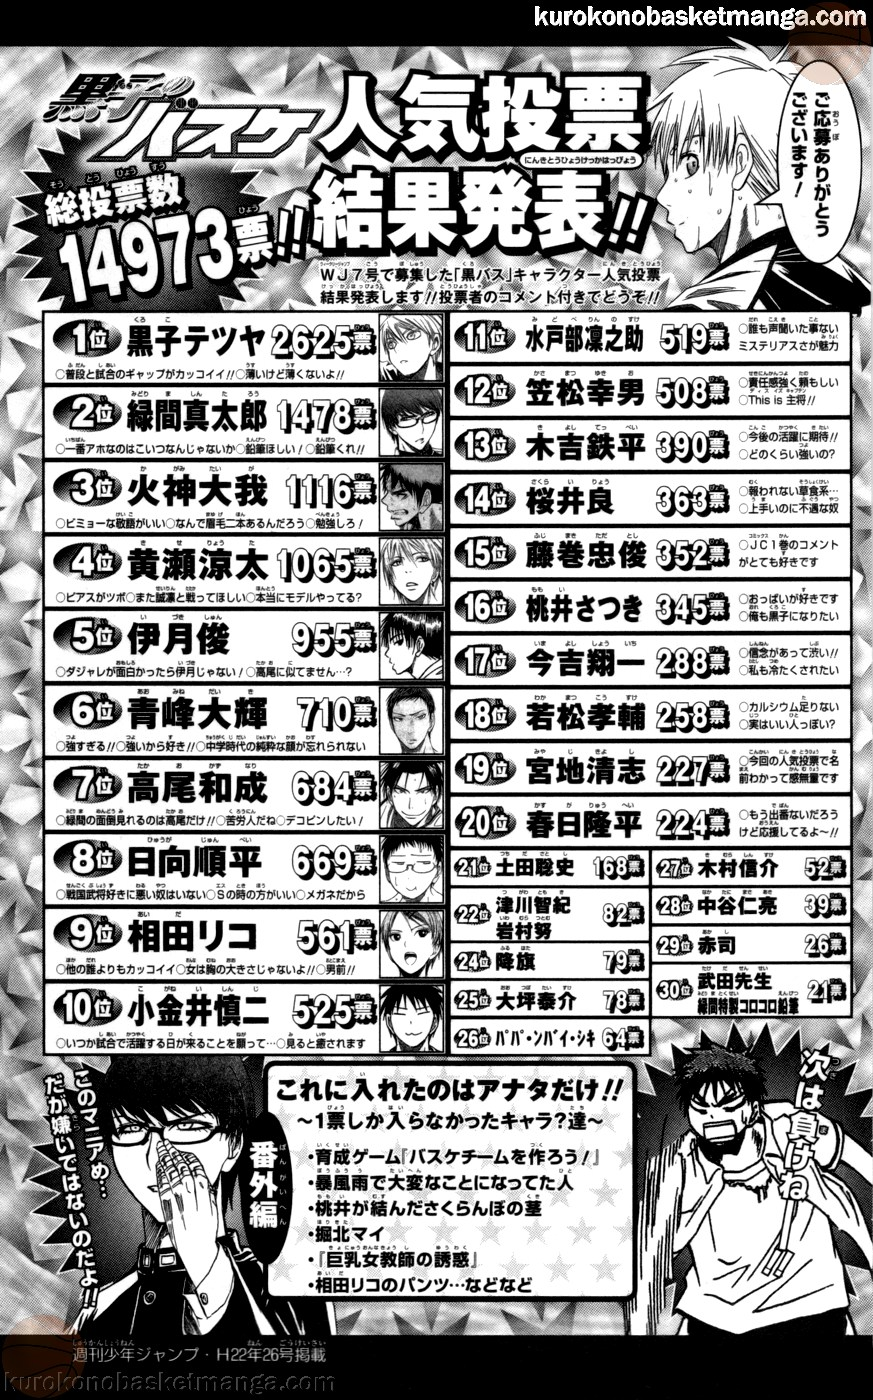 Kuroko no Basket Manga Chapter 89 - Image 22